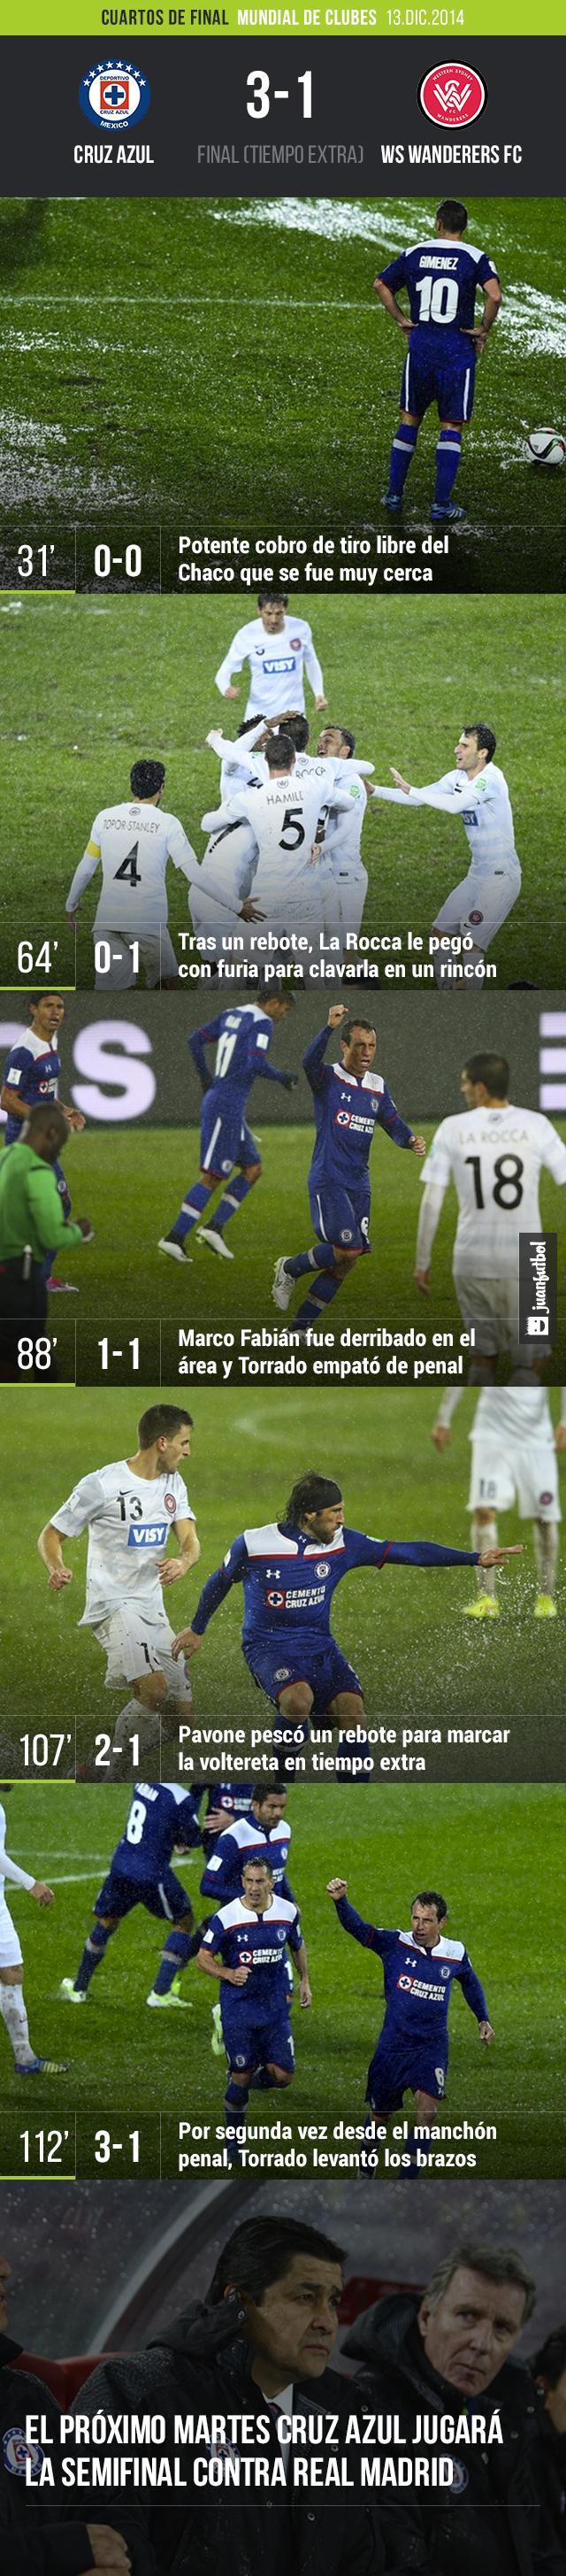 Cruz Azul vs. WS Wanderers